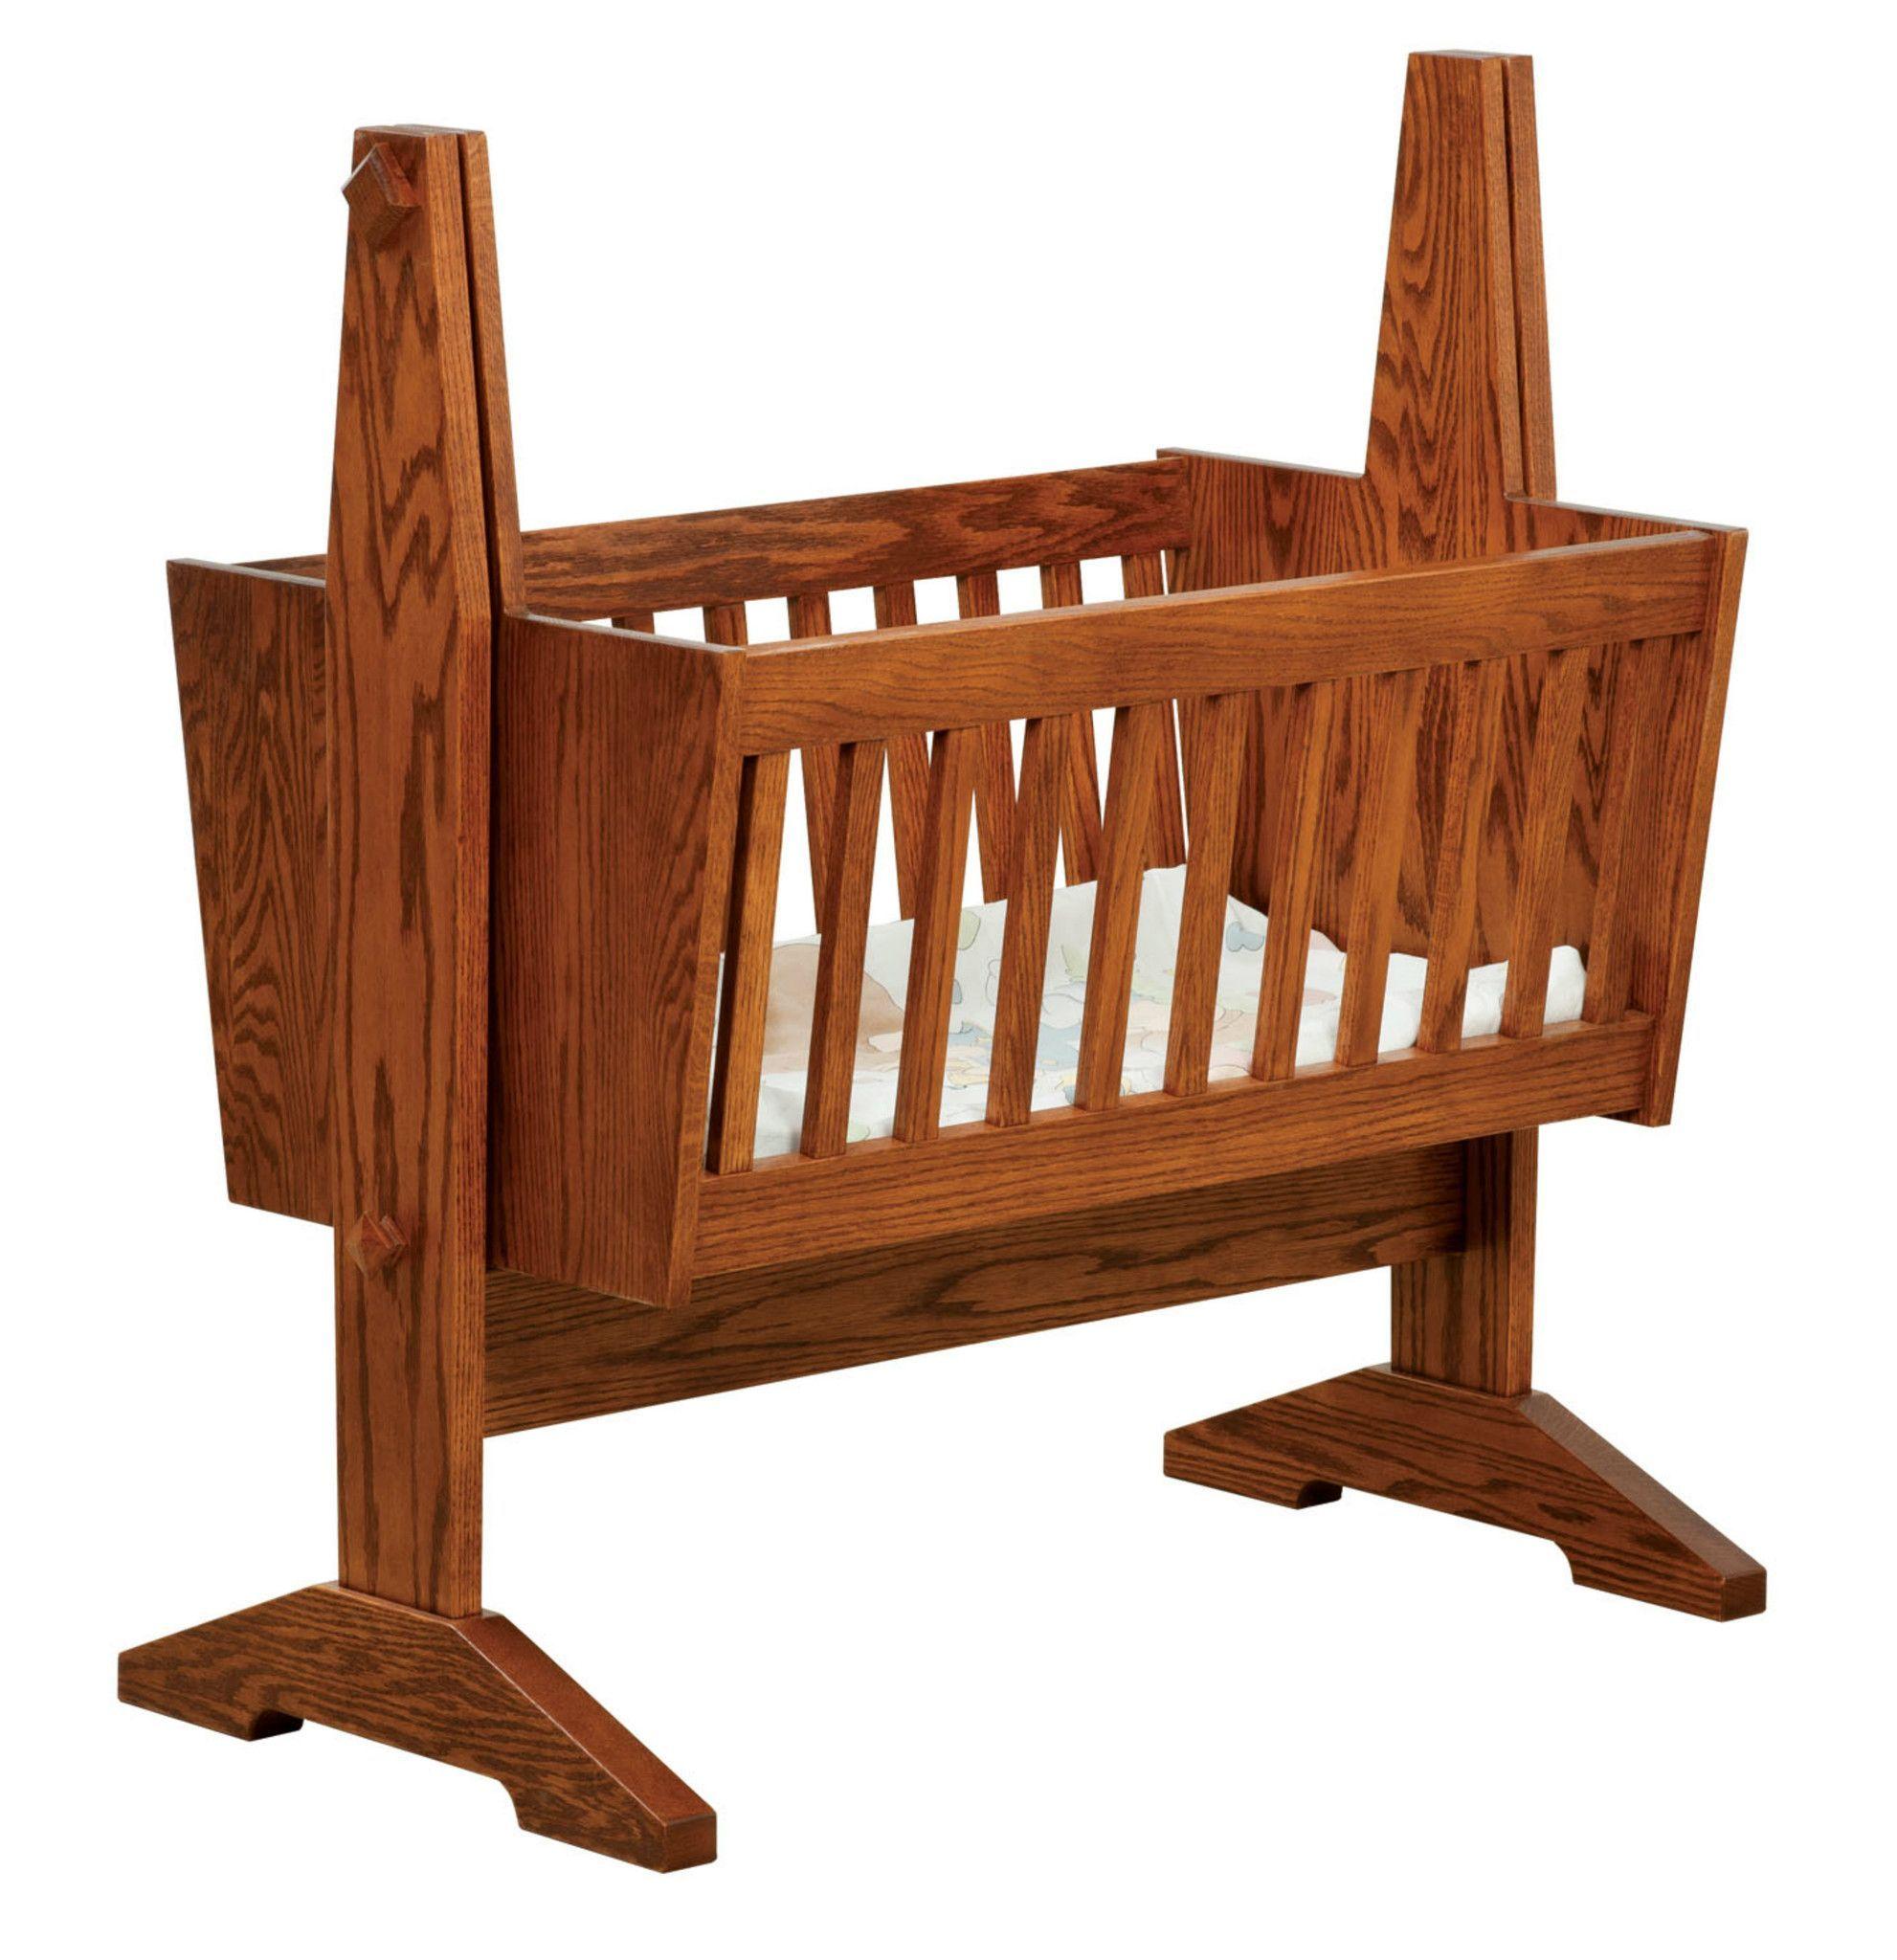 compact nursery furniture. Wooden Bassinet Shopping Tips : Compact Wood Baby Cribs. Nursery Furniture